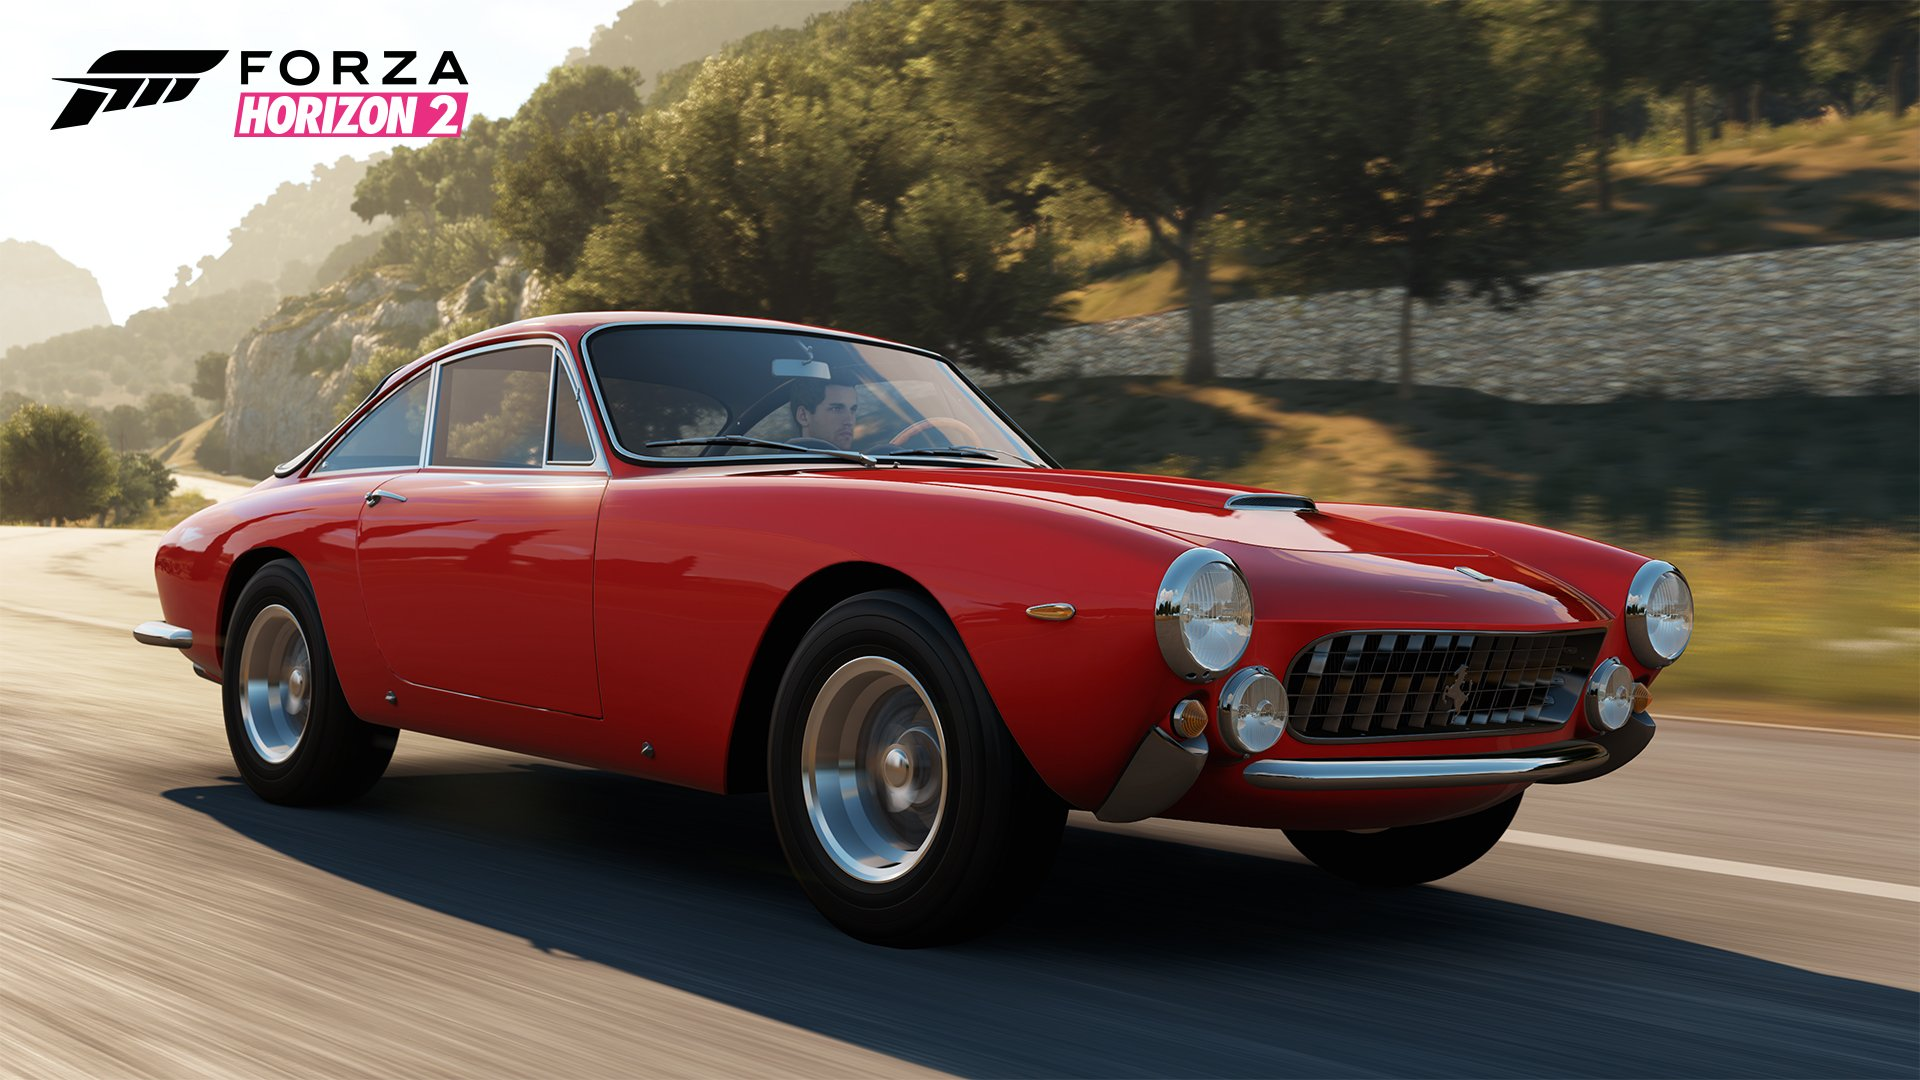 Forza Horizon 2 More Cars Revealed